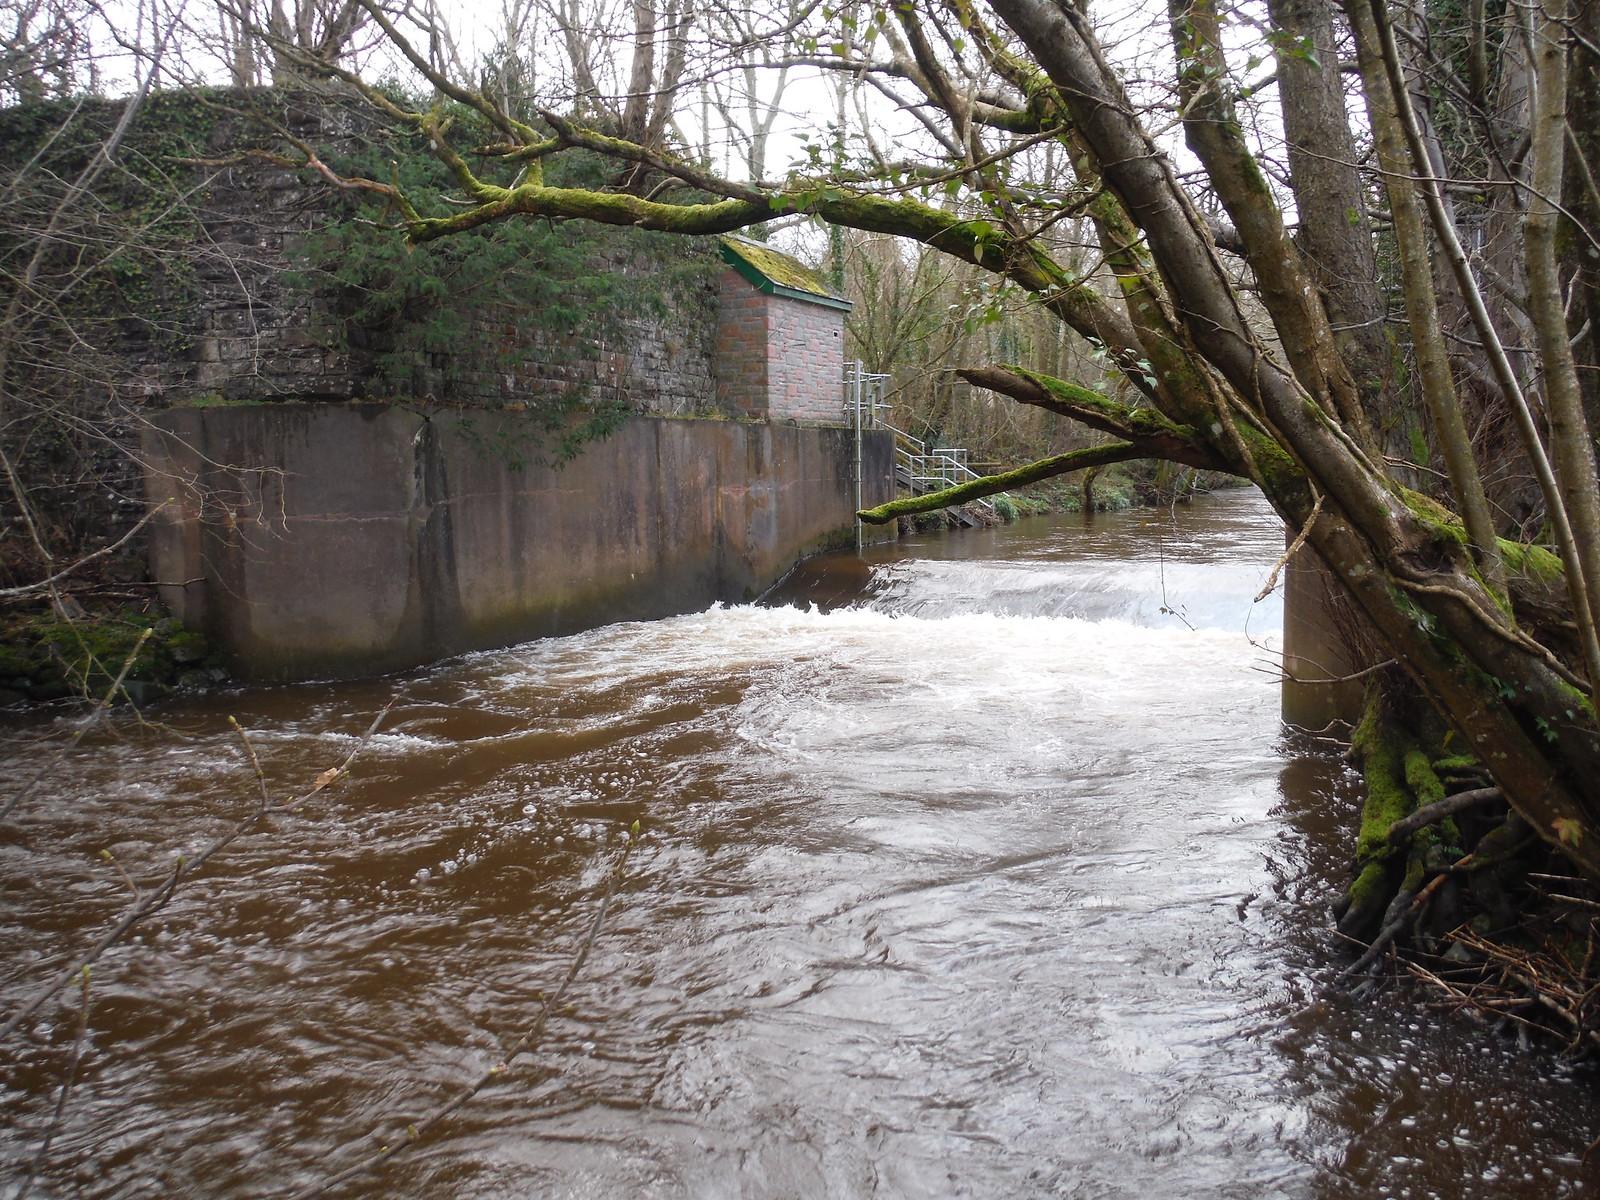 Remains of Old Railway Bridge, Ysgir River SWC Walk 306 - Brecon Circular (via Y Gaer, Battle and Pen-y-crug)